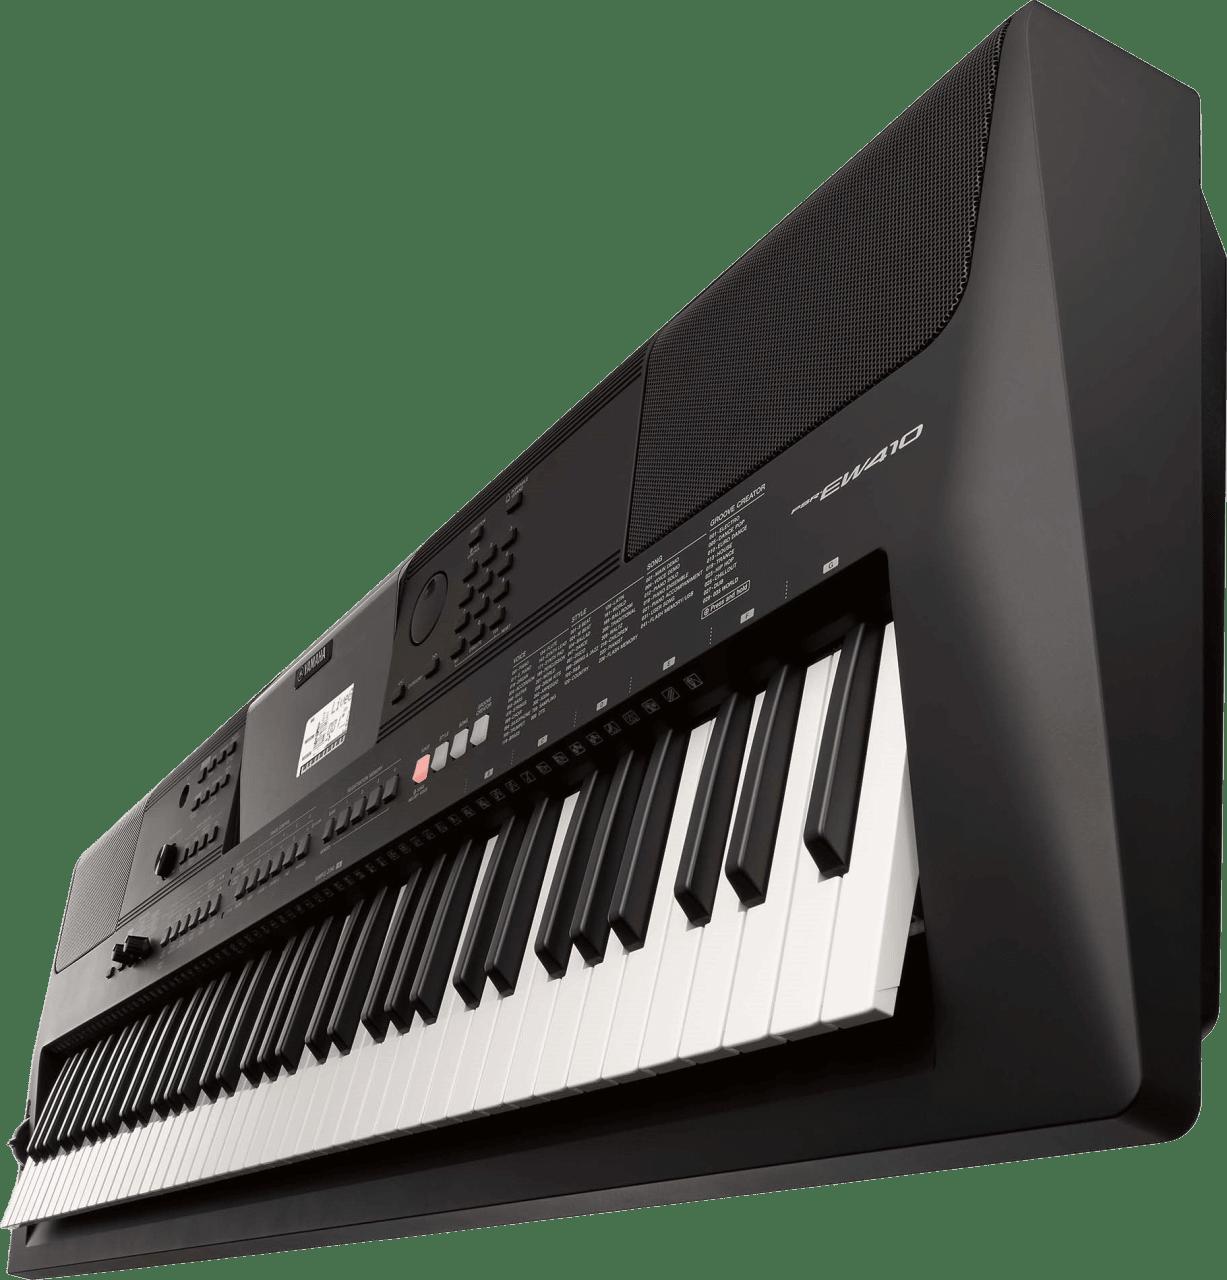 Black Yamaha PSR-EW410 76-Key Portable Keyboard.3